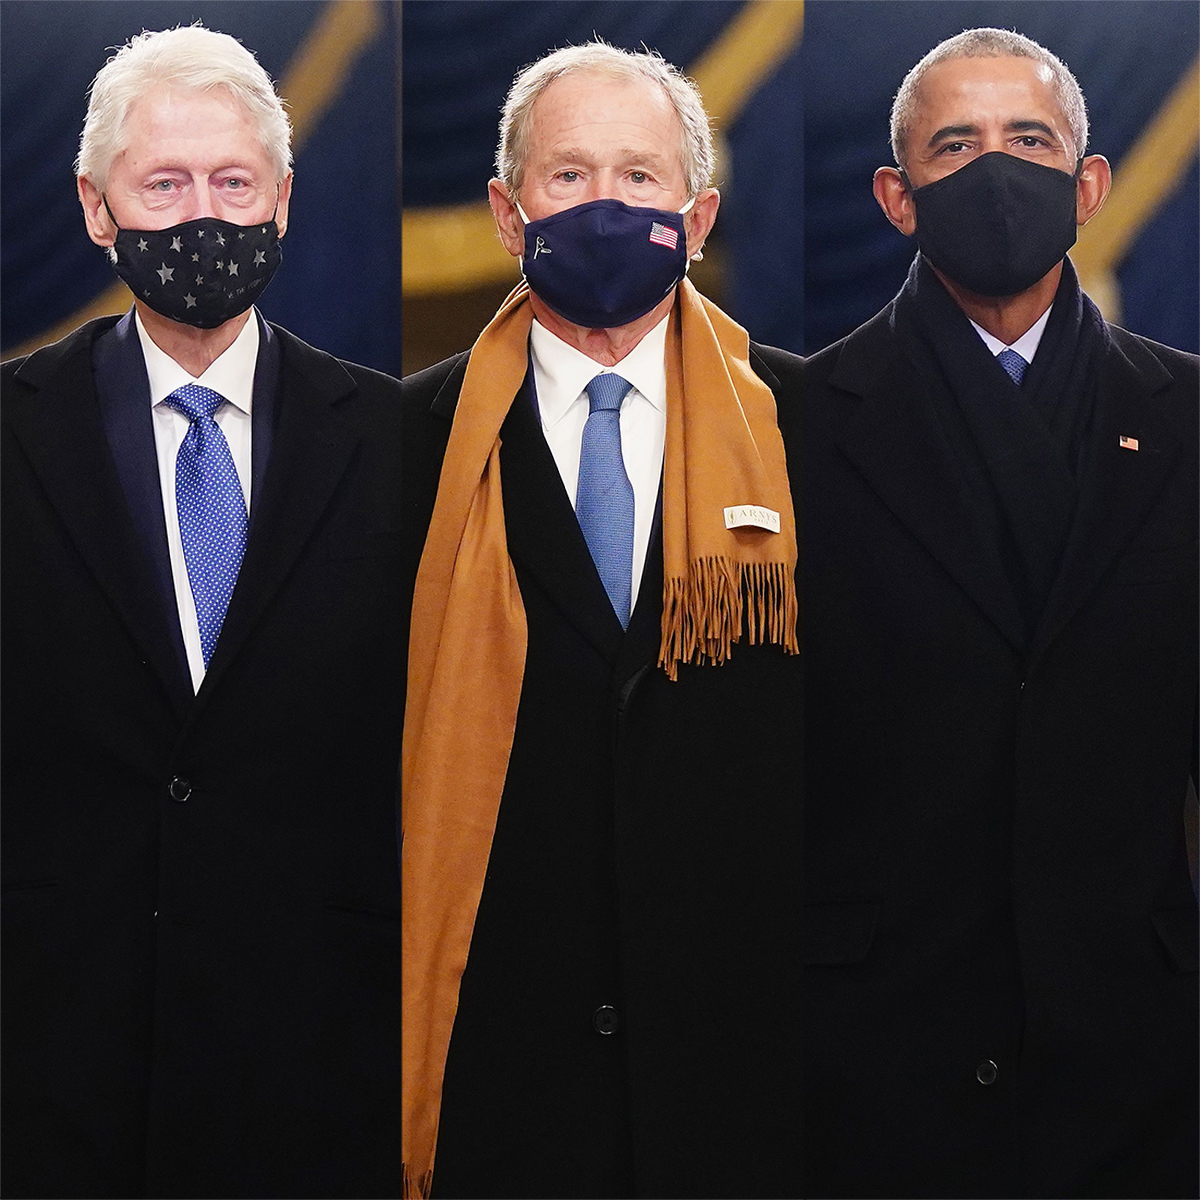 Former Presidents Barack Obama, George W. Bush and Bill Clinton Reunite for Rare Inauguration Day Address